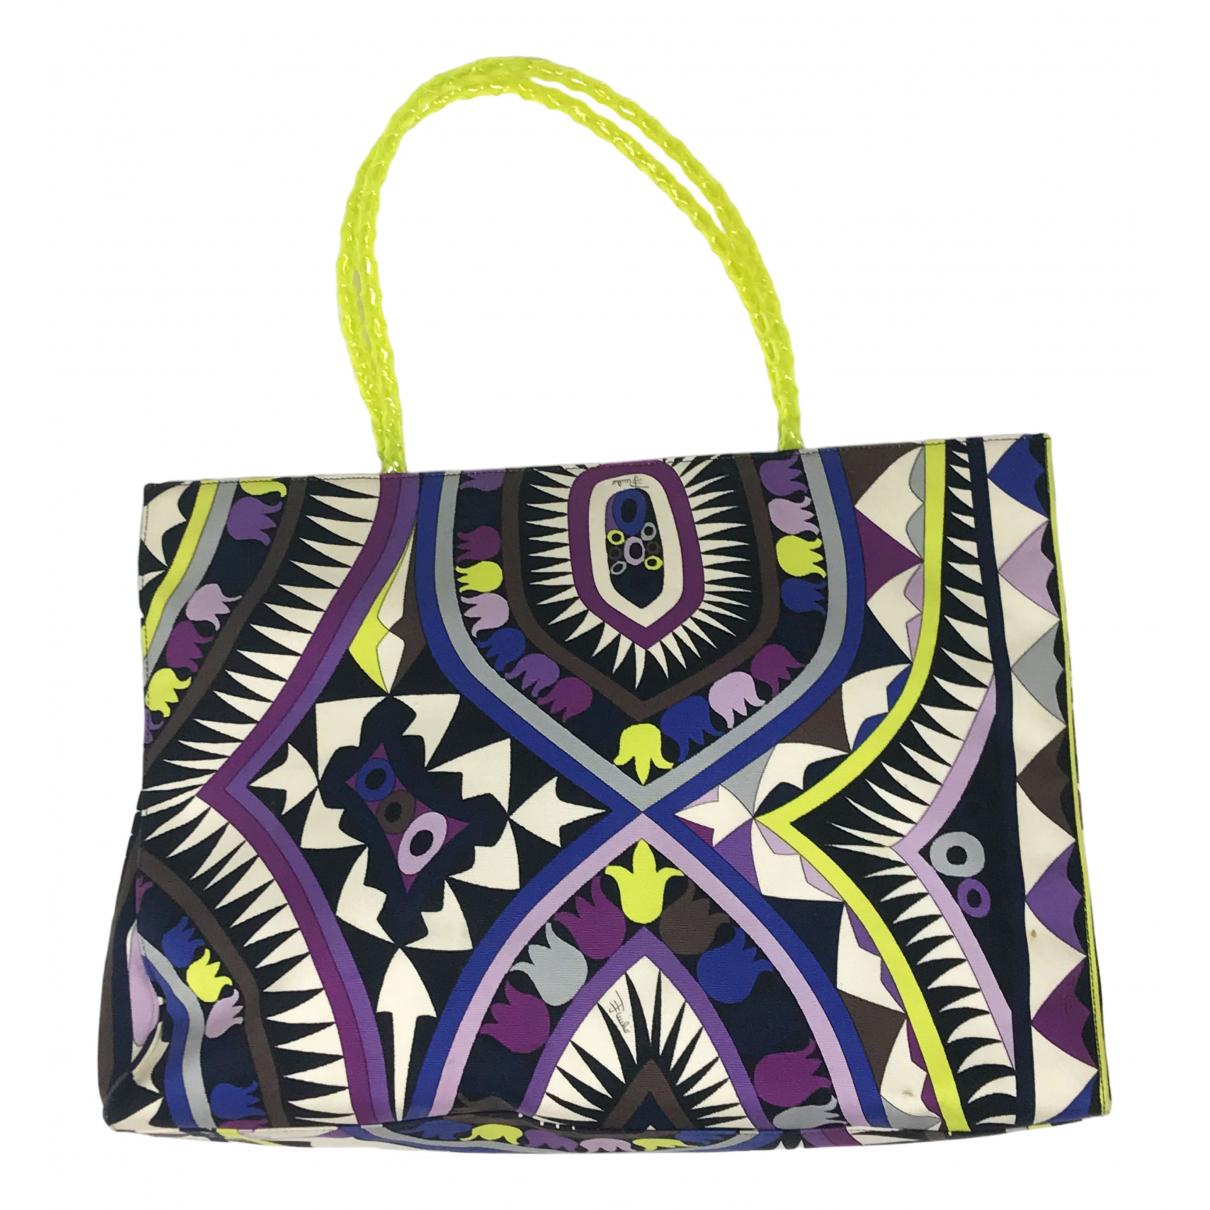 Emilio Pucci \N Purple Cotton handbag for Women \N